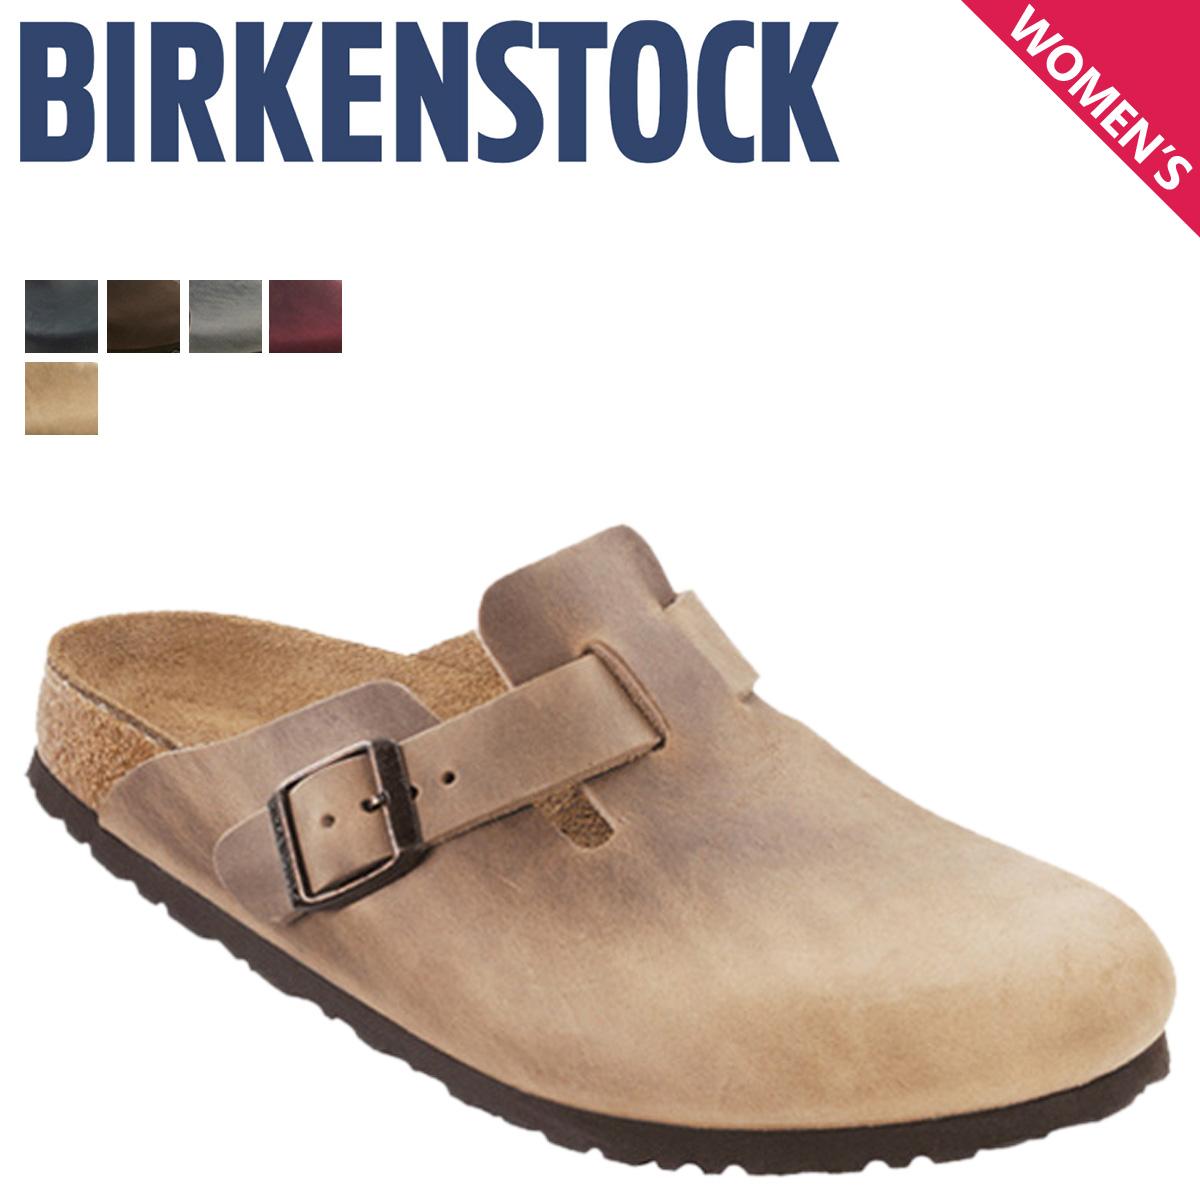 fe5516030b53 BIRKENSTOCK-Birkenstock Boston vilken Sandals normal width BOSTON men s  women s